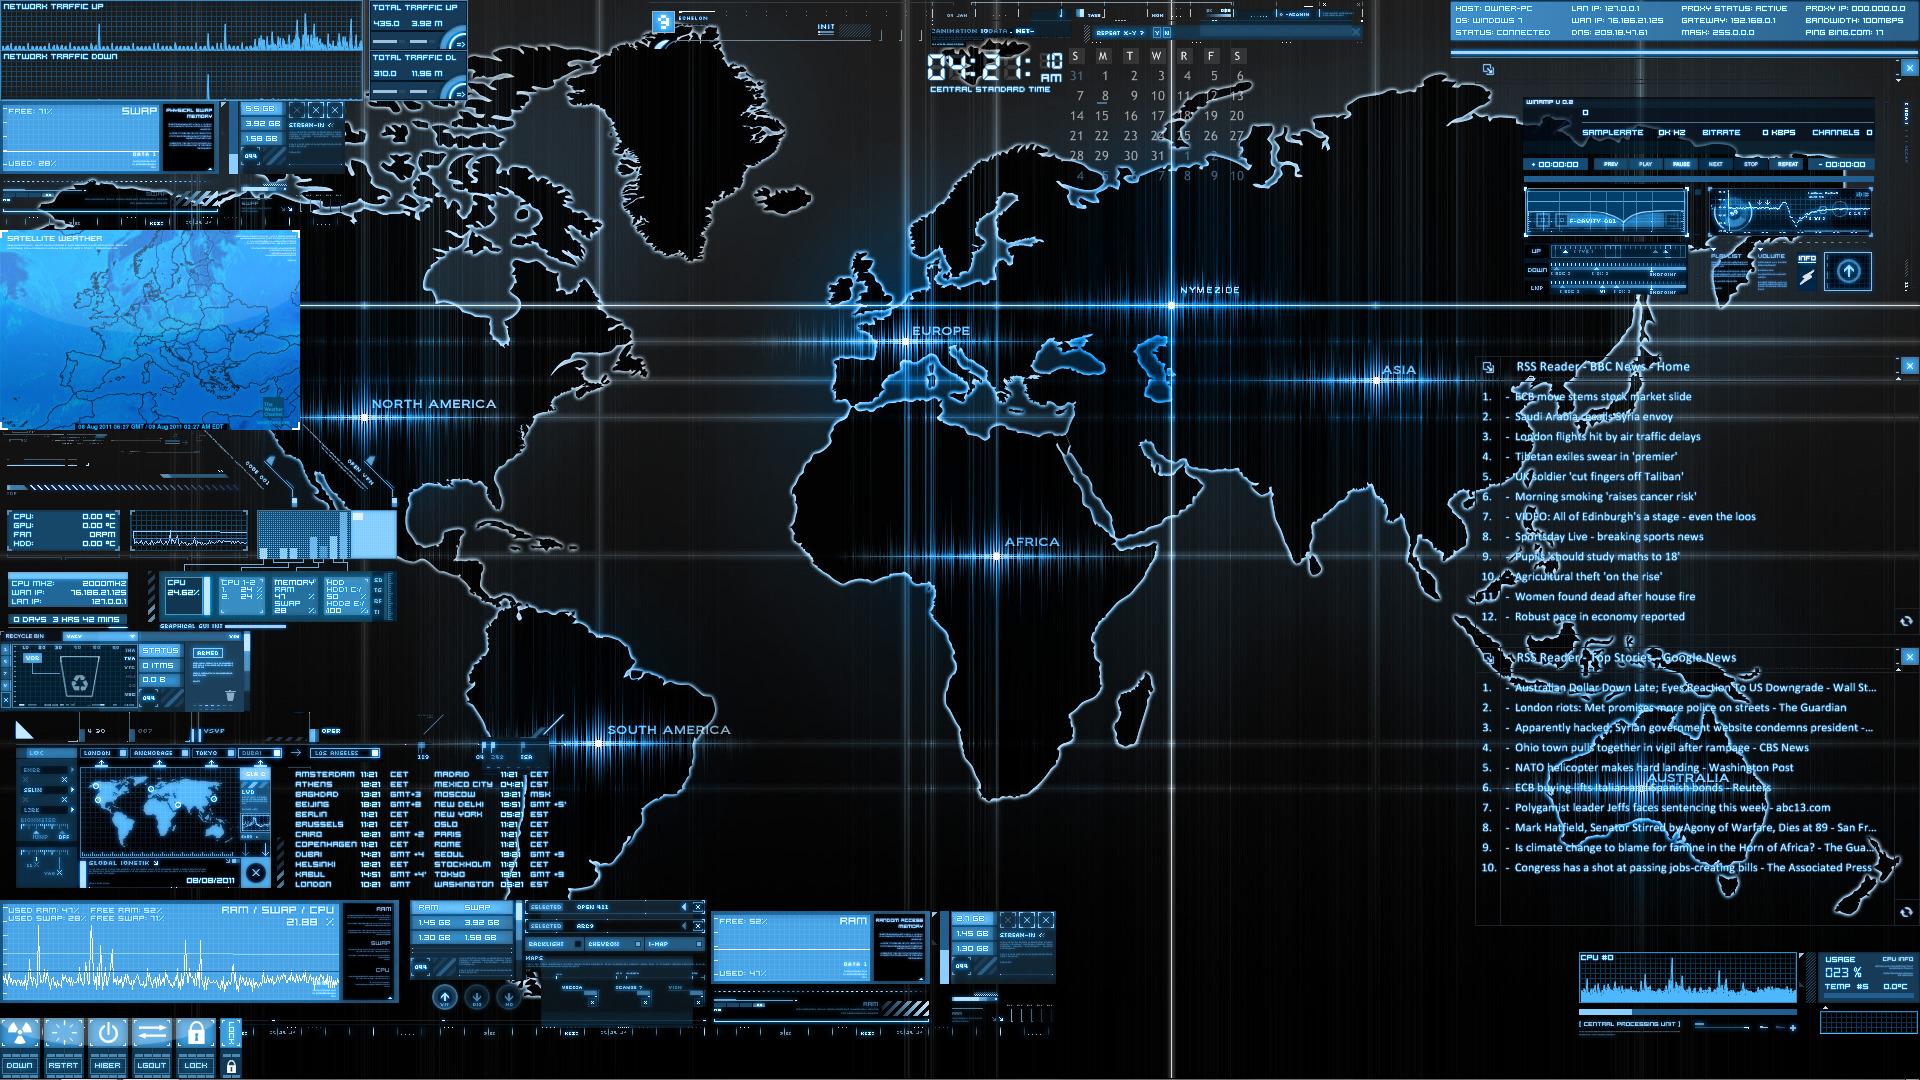 Alienware Logo Hd Wallpaper Conky Wallpapers Hd Desktop And Mobile Backgrounds